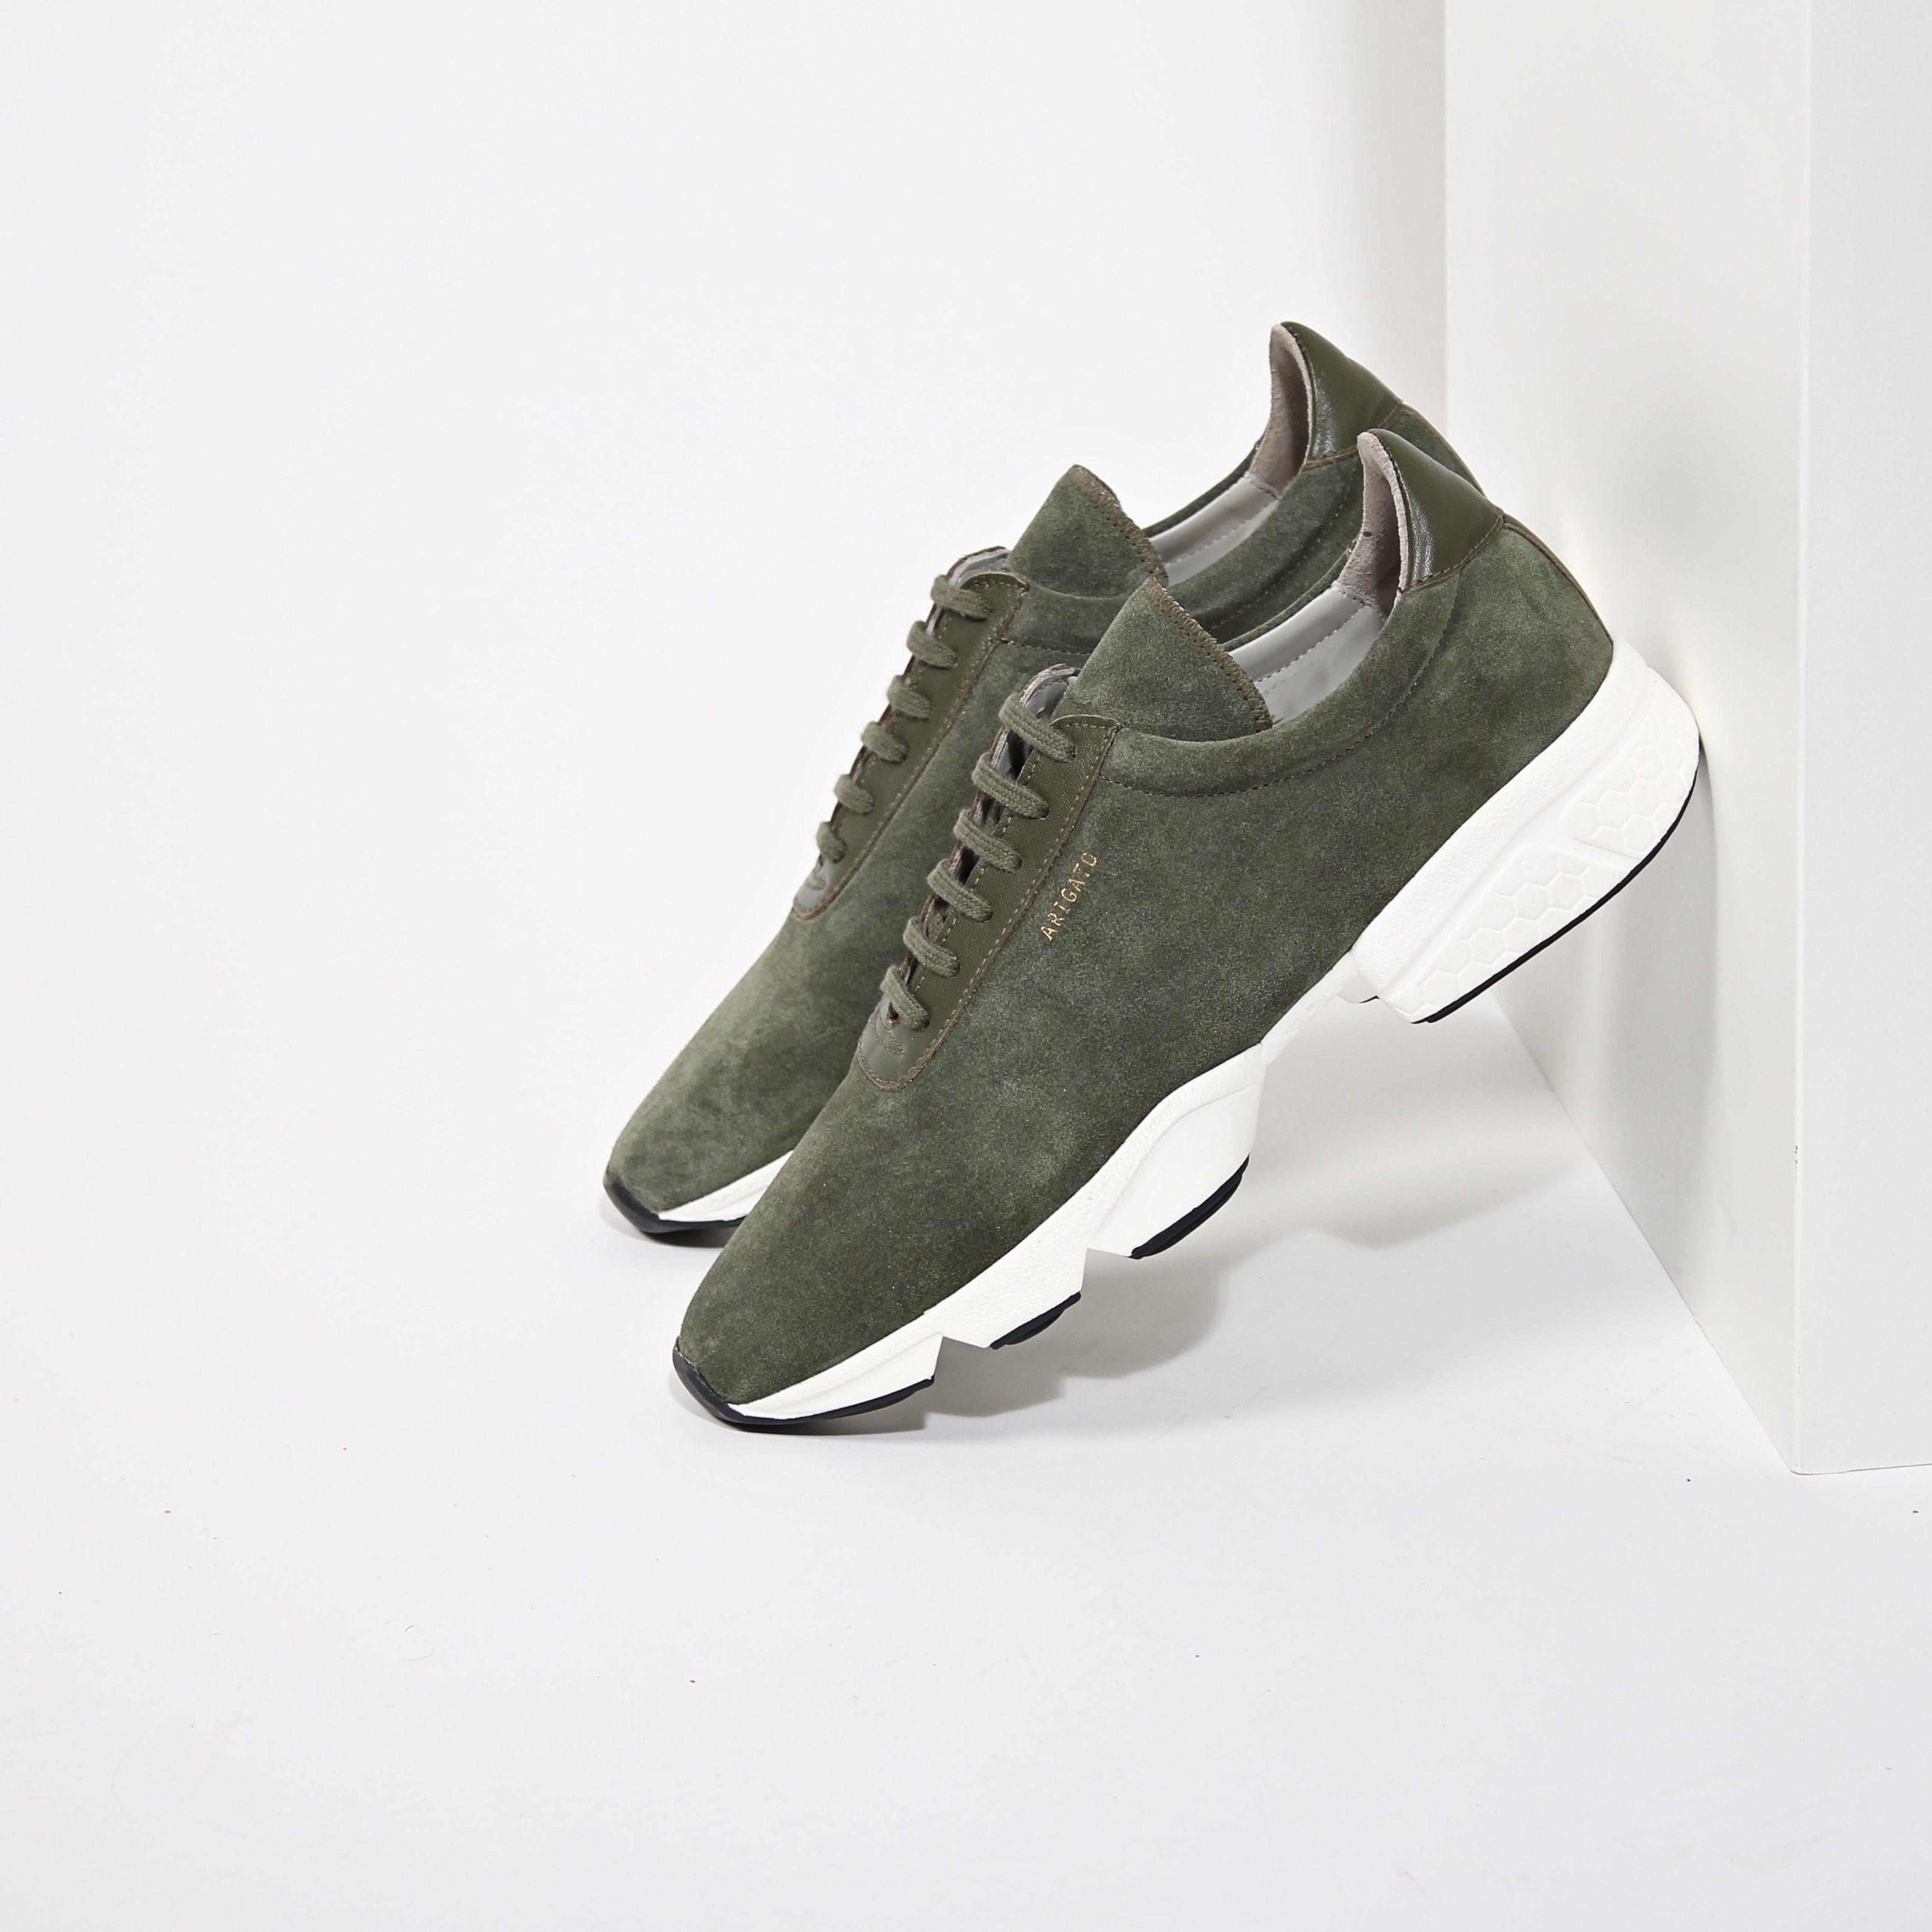 Axel Arigato suede sneaker, handmade in Italy axelarigato.com